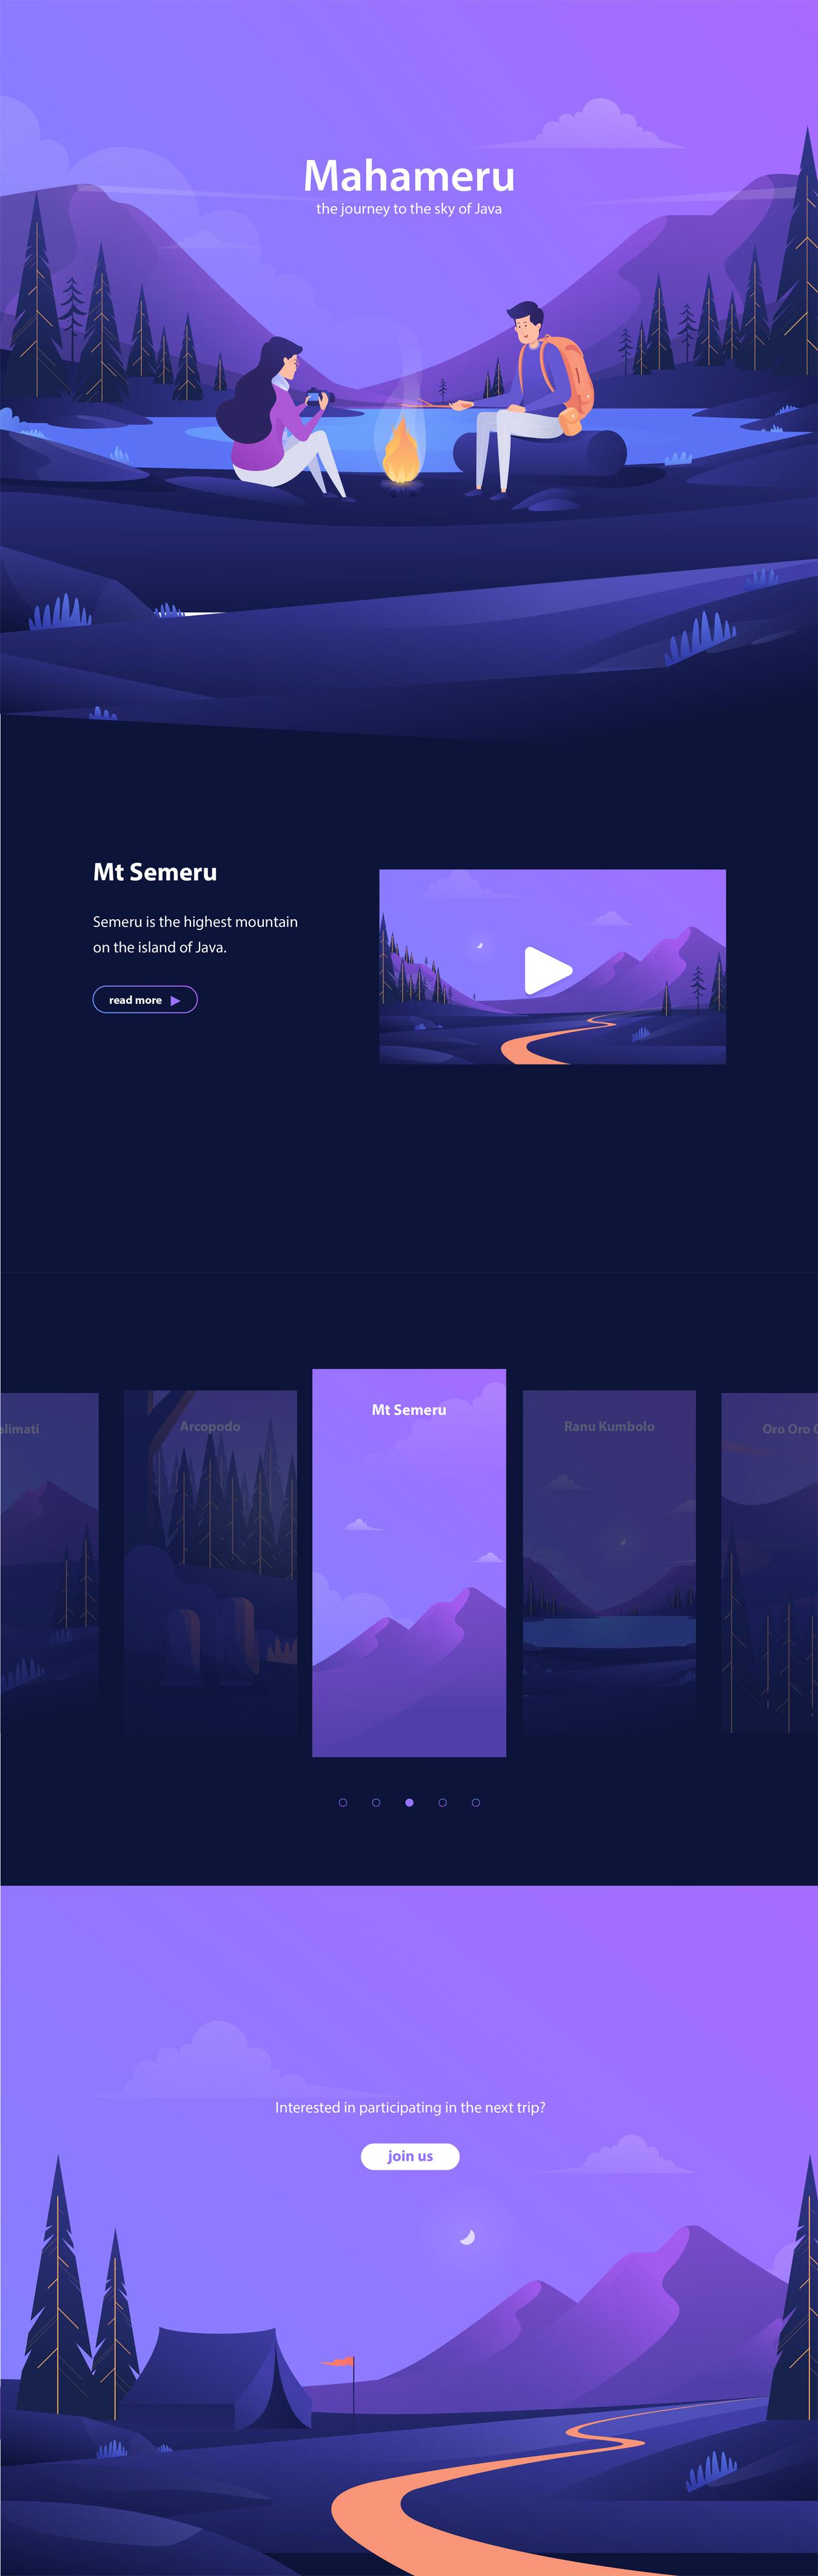 Mahameru Landing Page Design Ideas